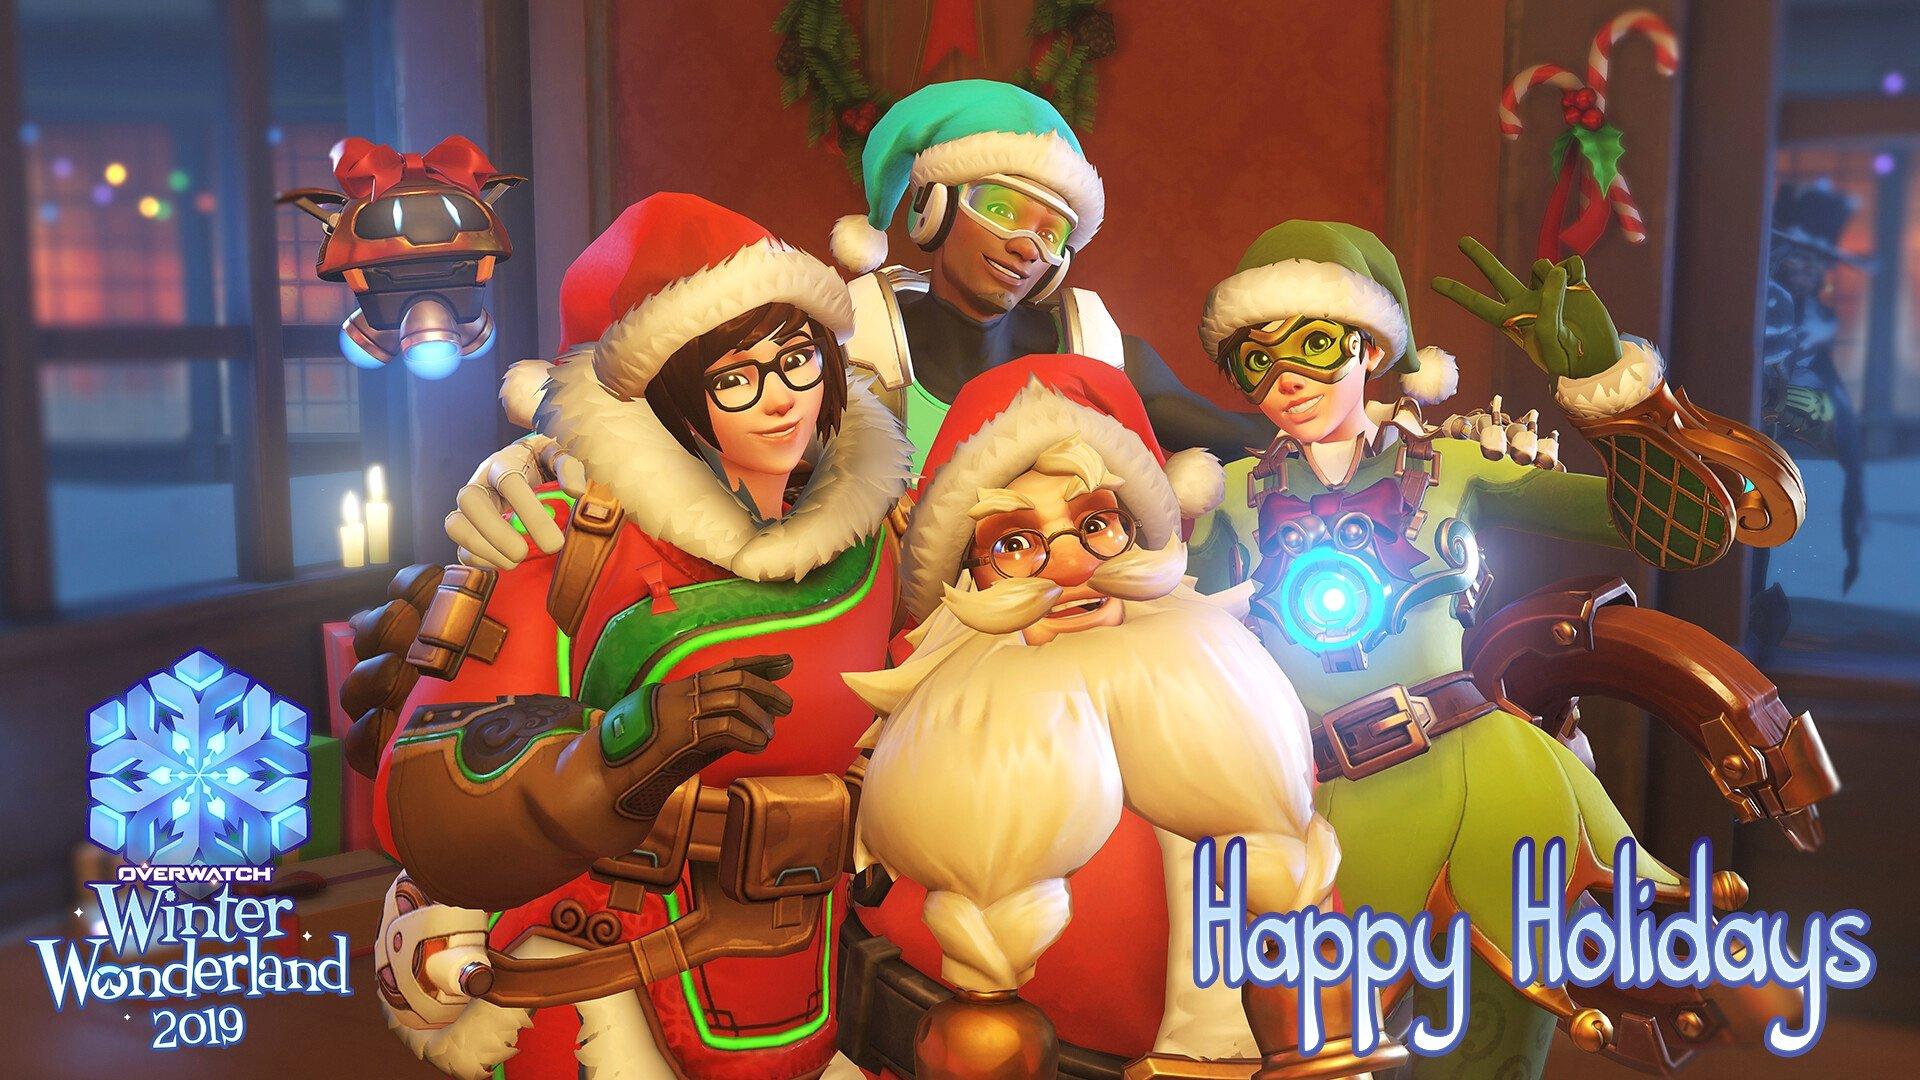 Blizzard Happy Holidays Wallpaper